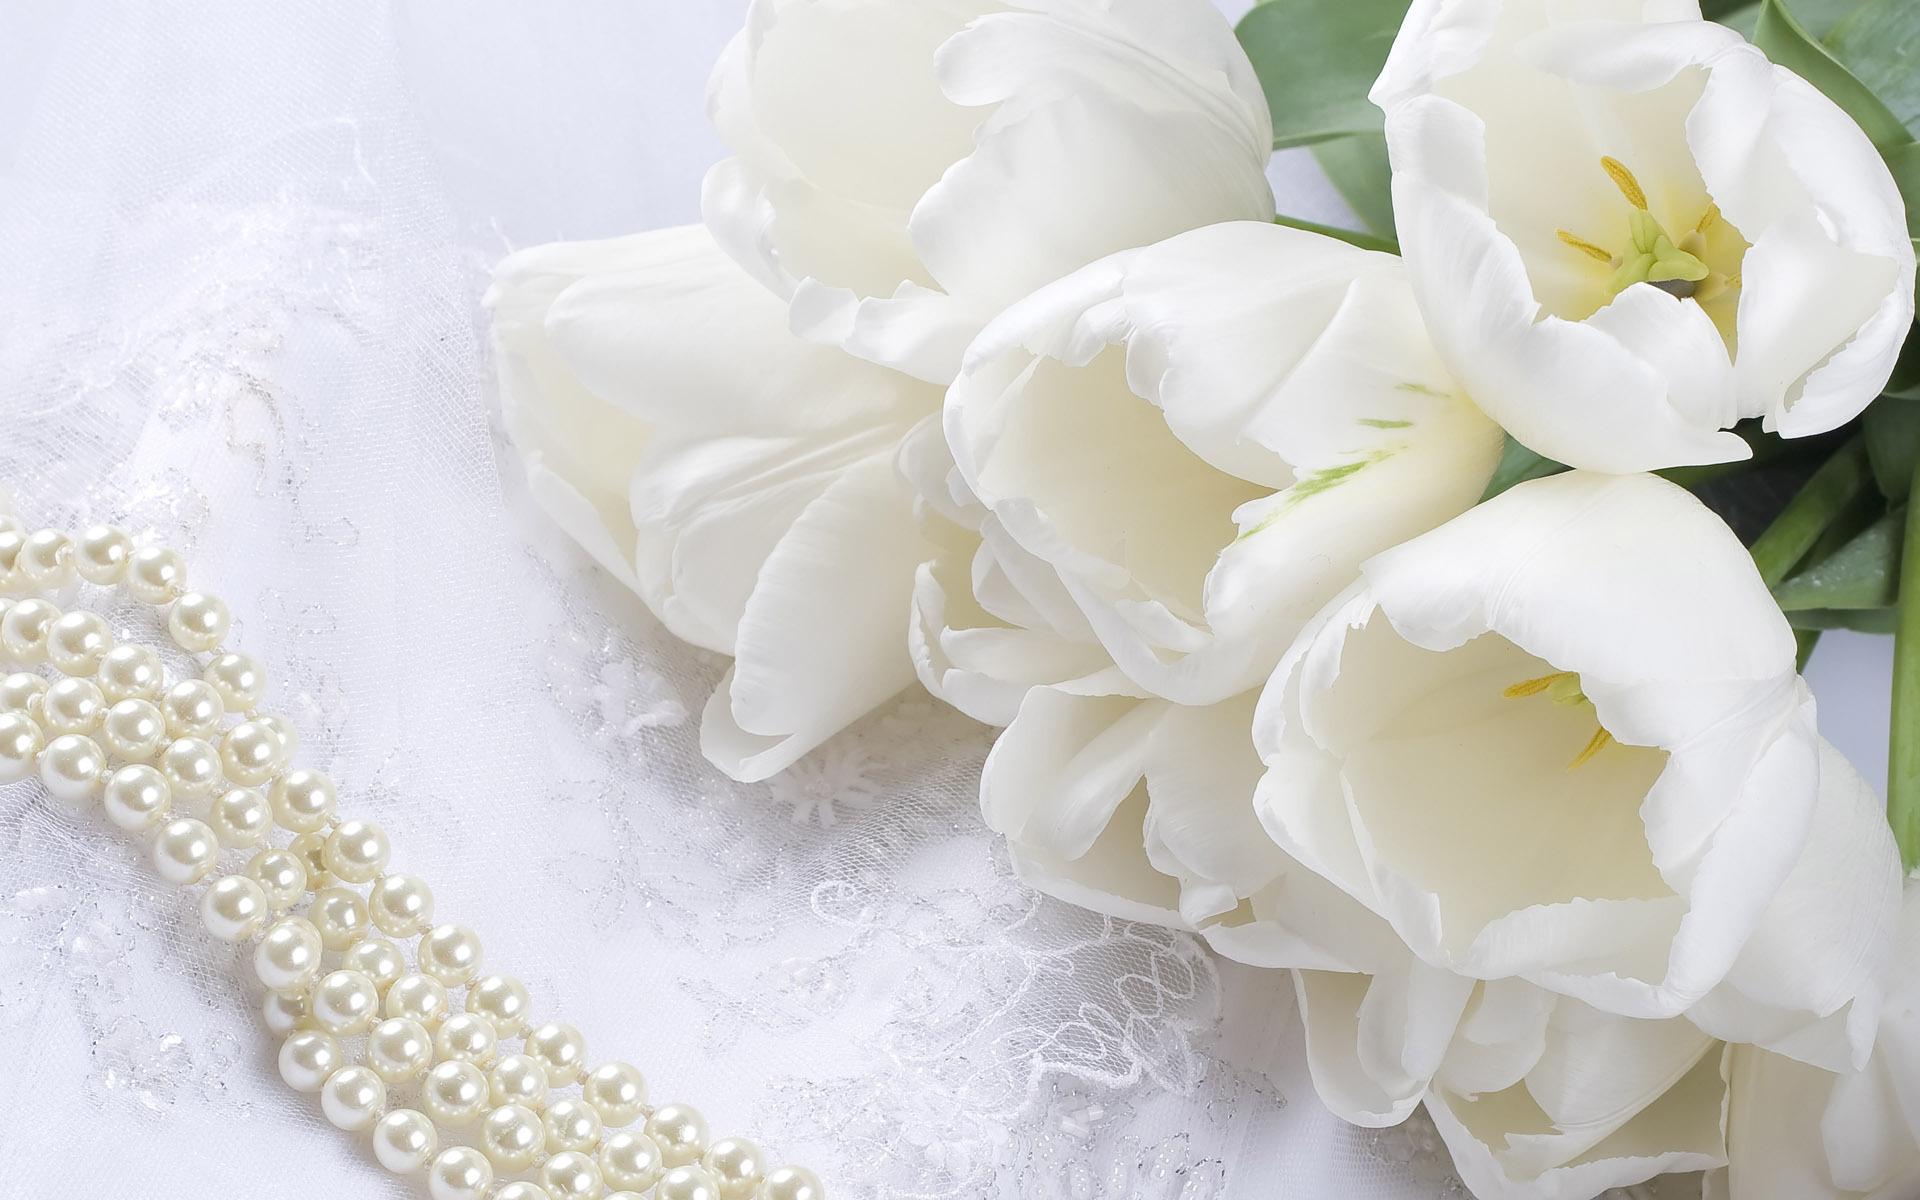 Цветы белый жемчуг